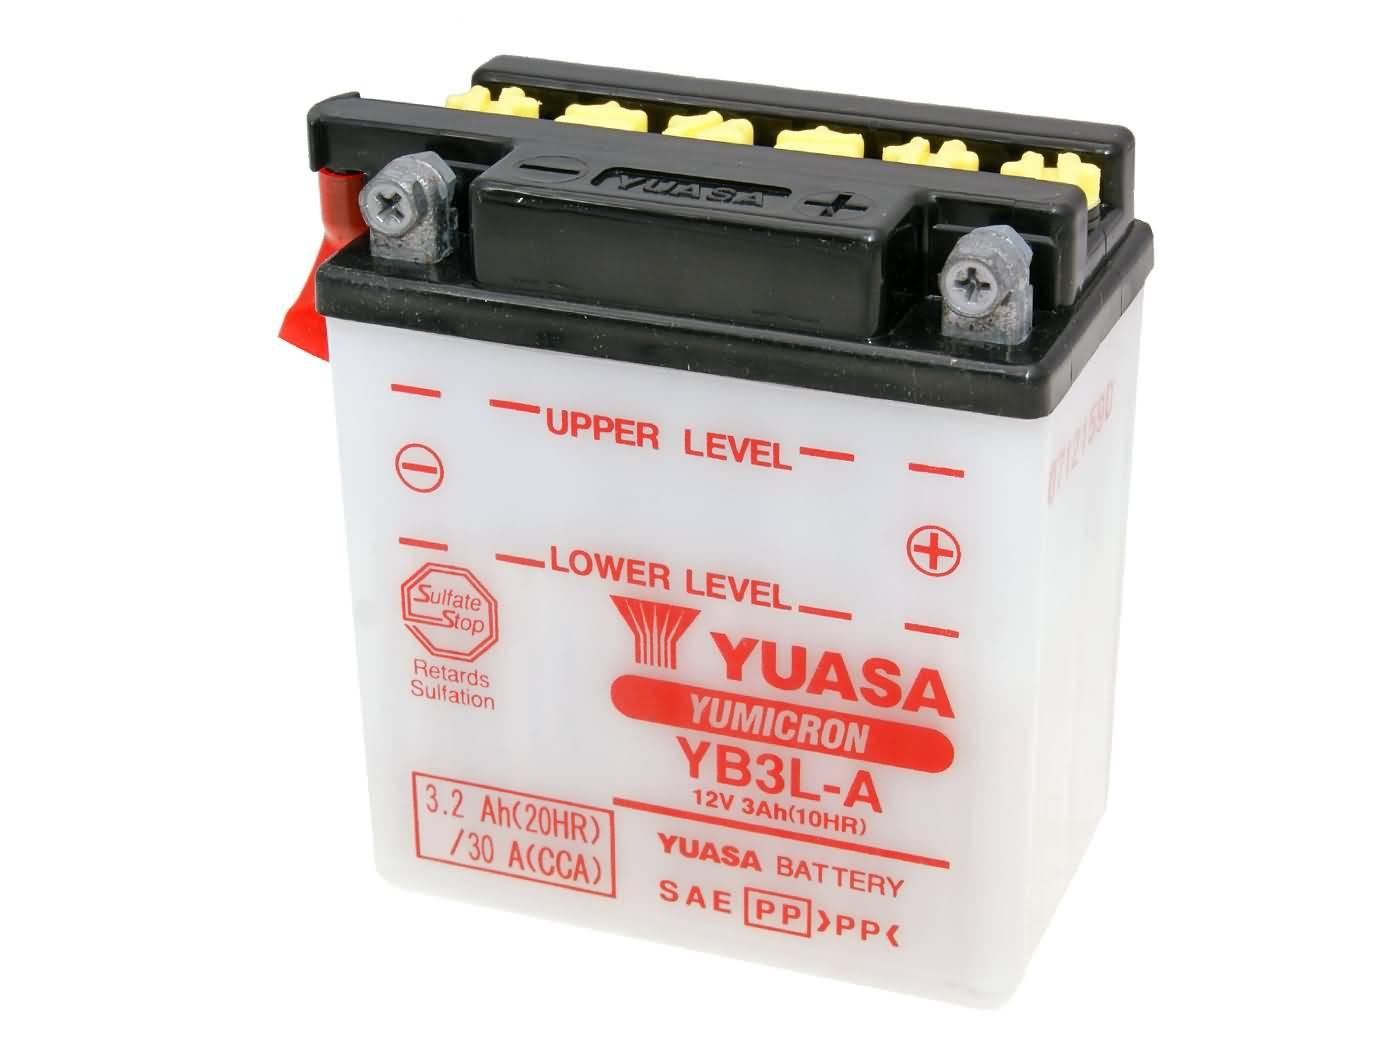 Yuasa YuMicron YB3L-A akkumulátor - savcsomag nélkül